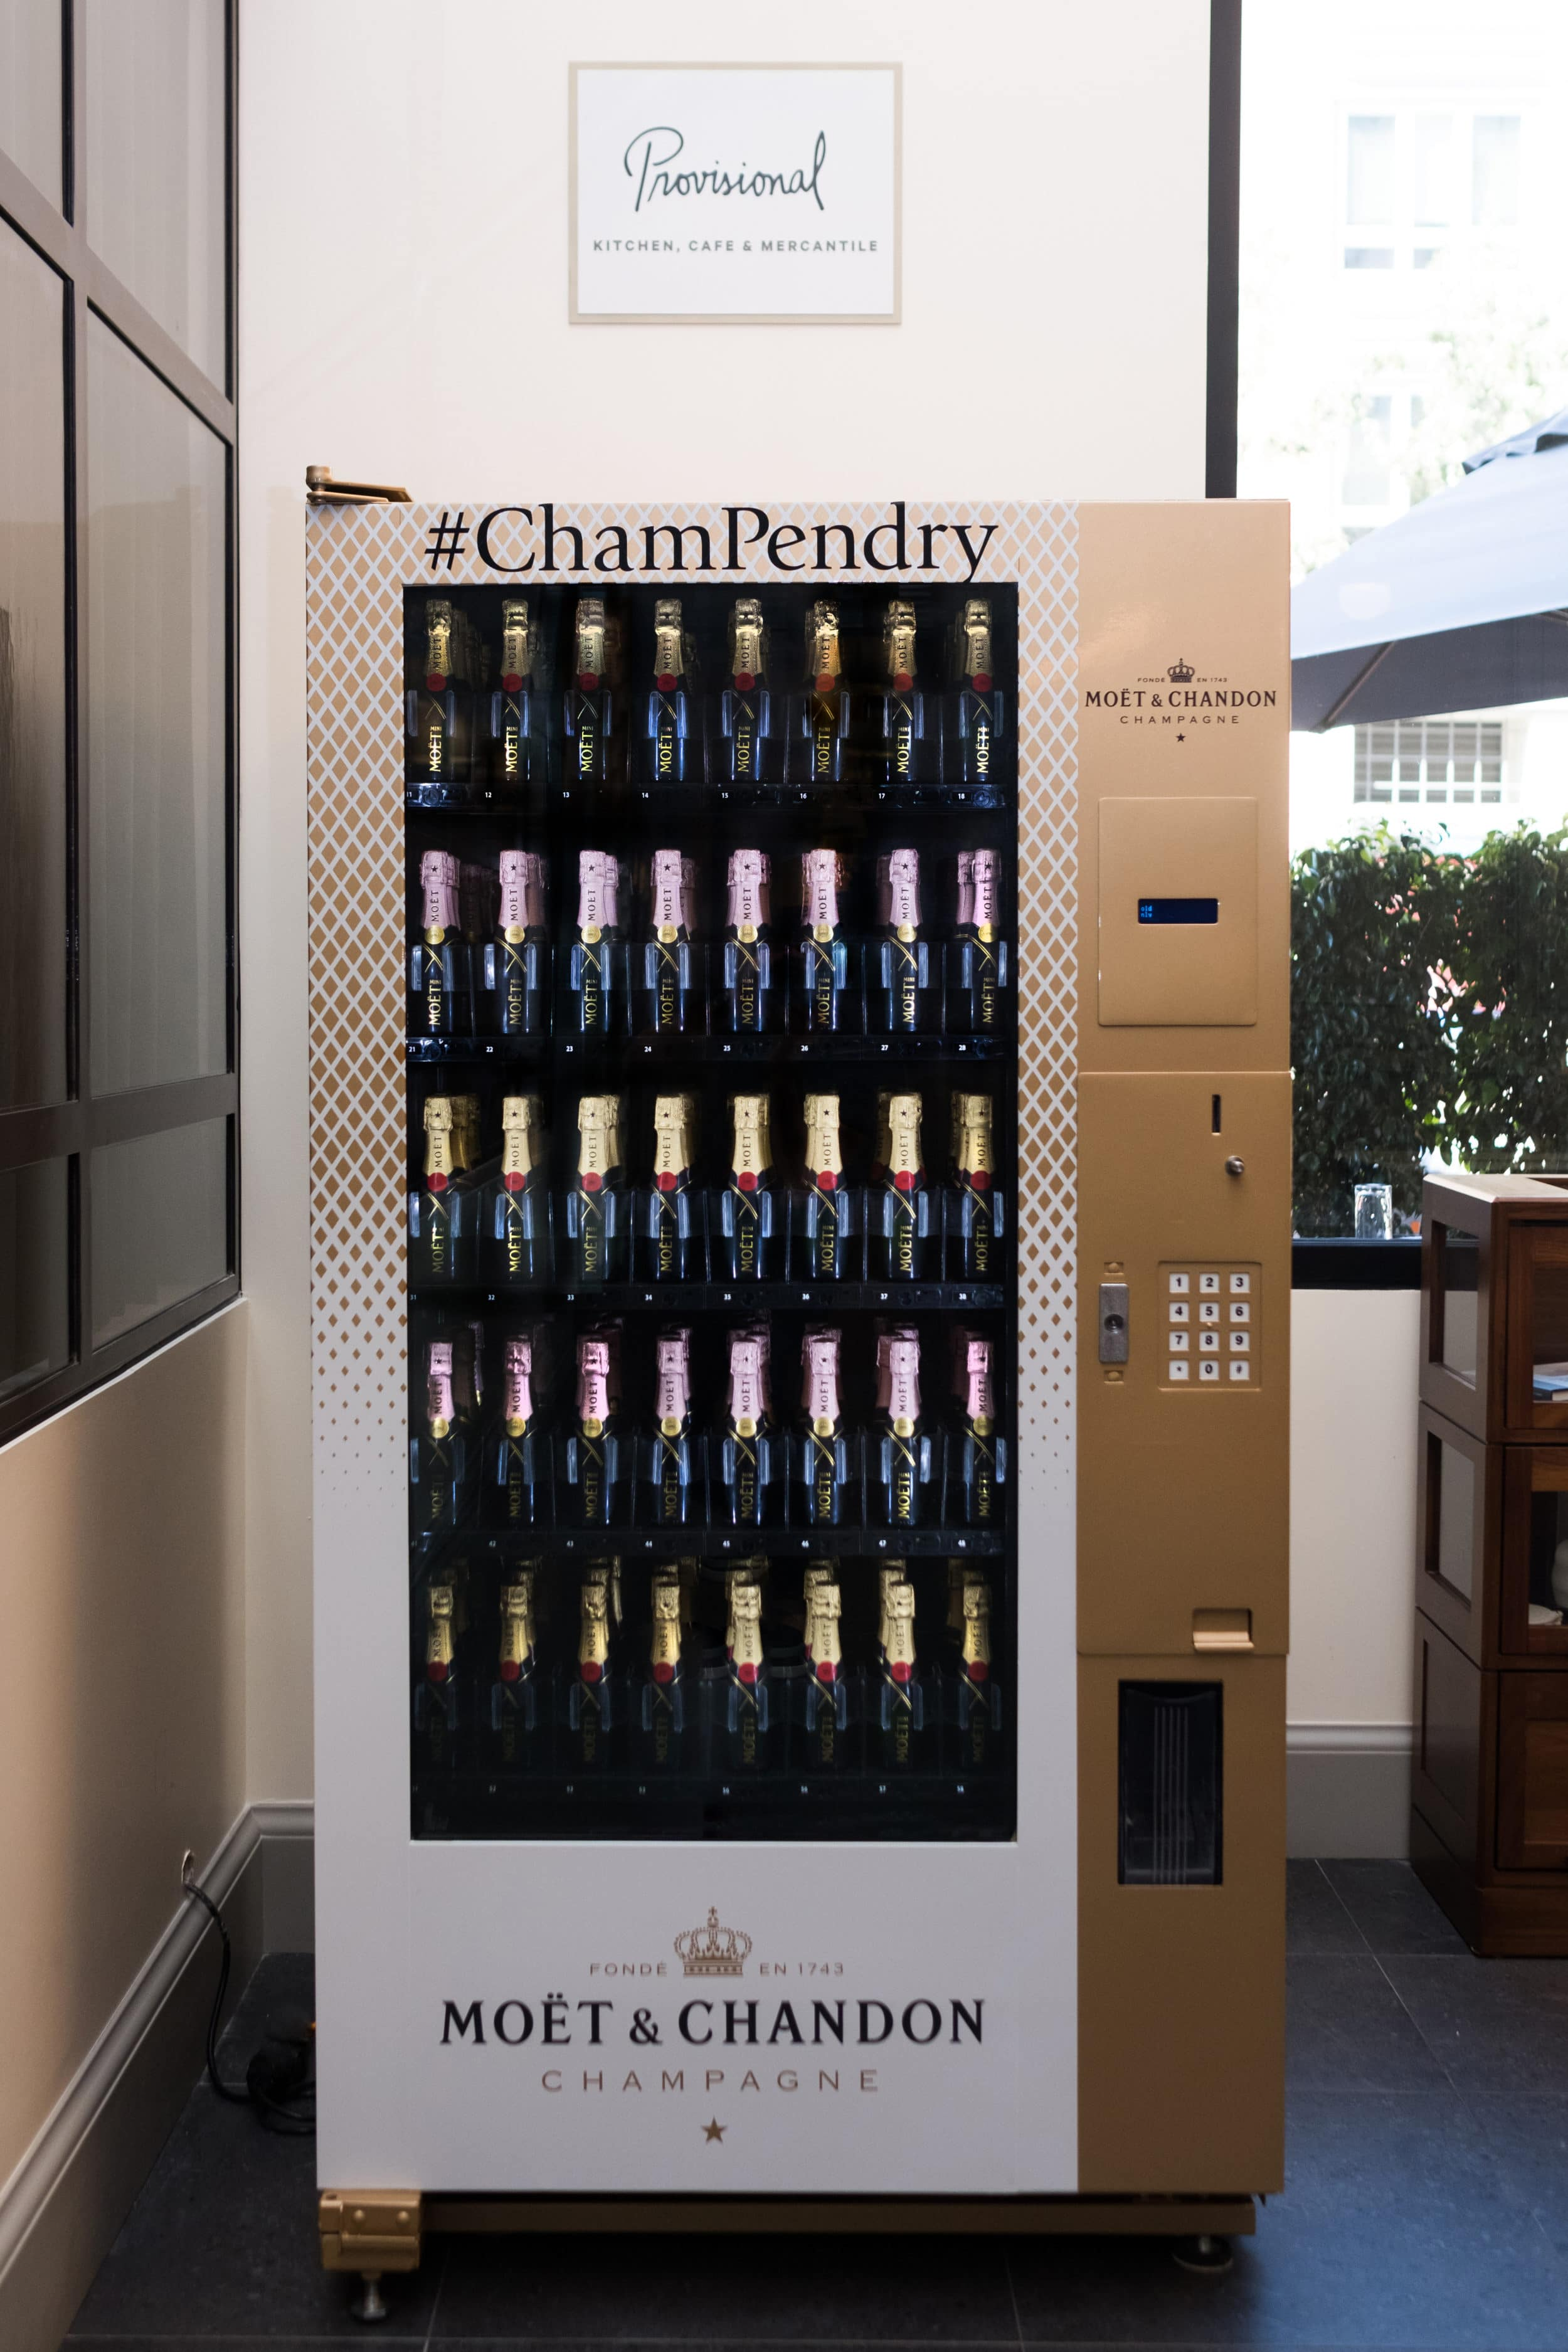 Pendry San Diego Moet & Chandon champagne vending machine